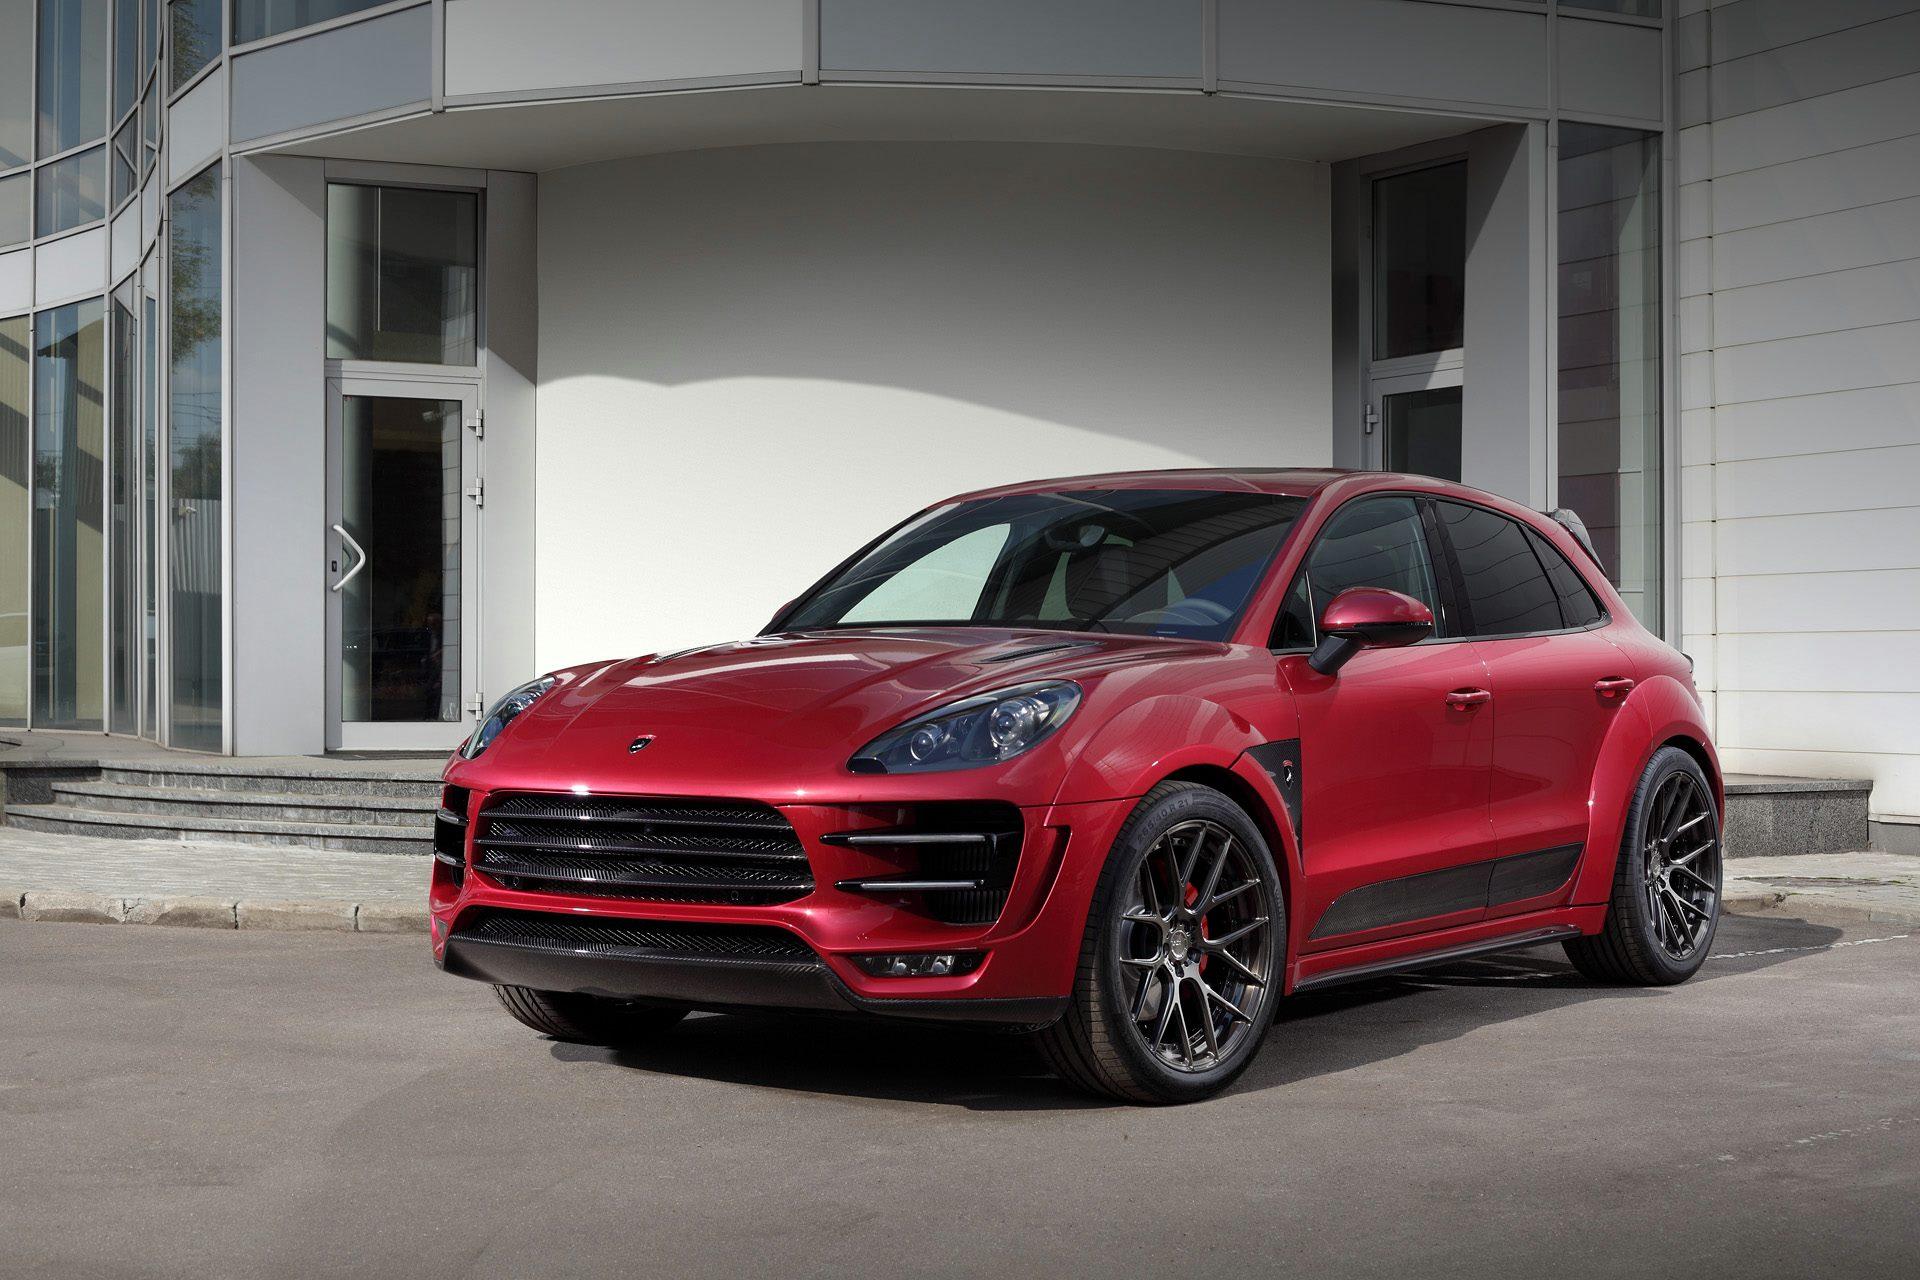 Porsche Mancan Ursa By Topcar Gets Cherry Red Paint And